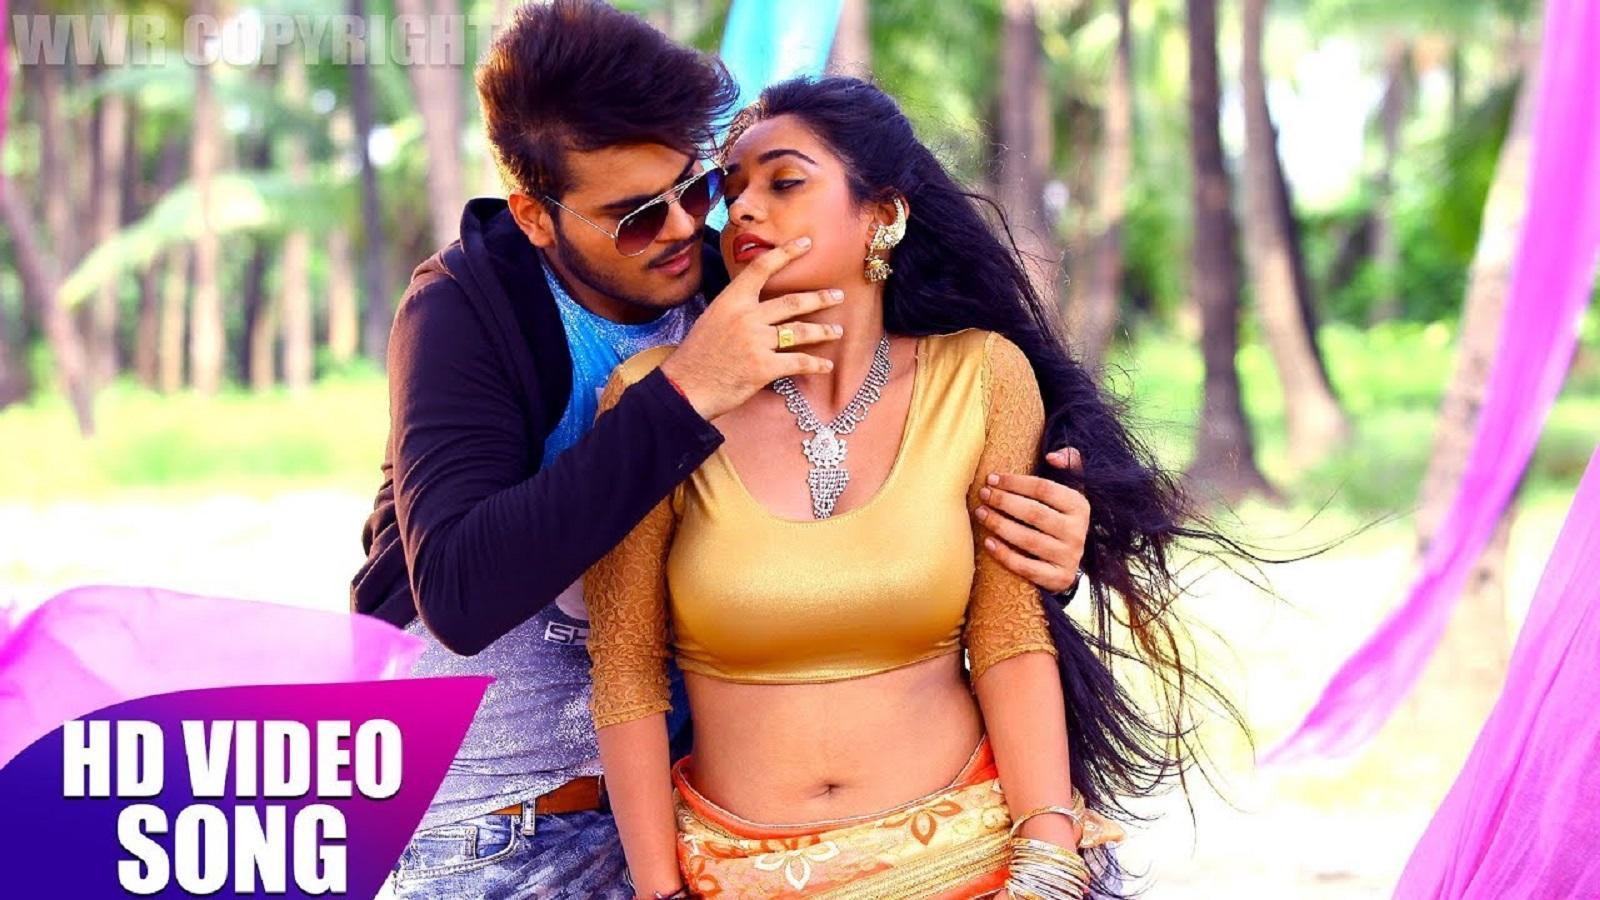 Watch: Bhojpuri song 'Power Tanatan' Ft  Ritu Singh and Arvind Akela Kallu